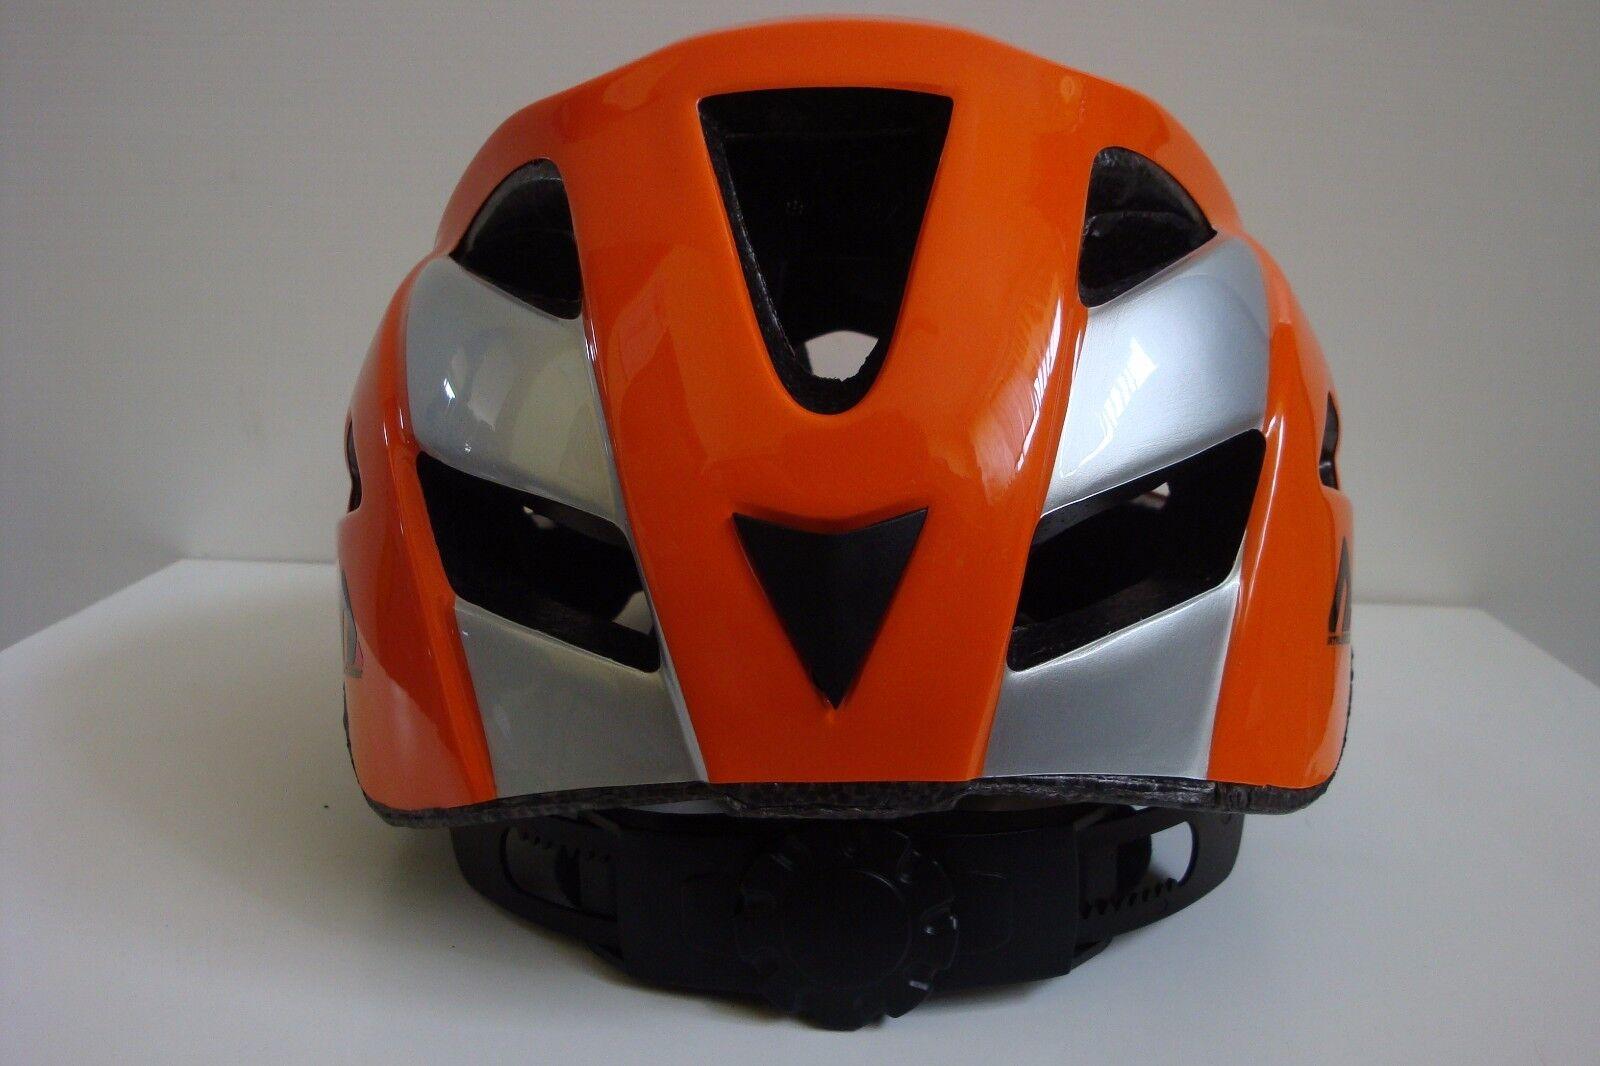 CASCO Bici Bicicletta ATALA TWENTY Mtb All Mountain Tg L arancione argento